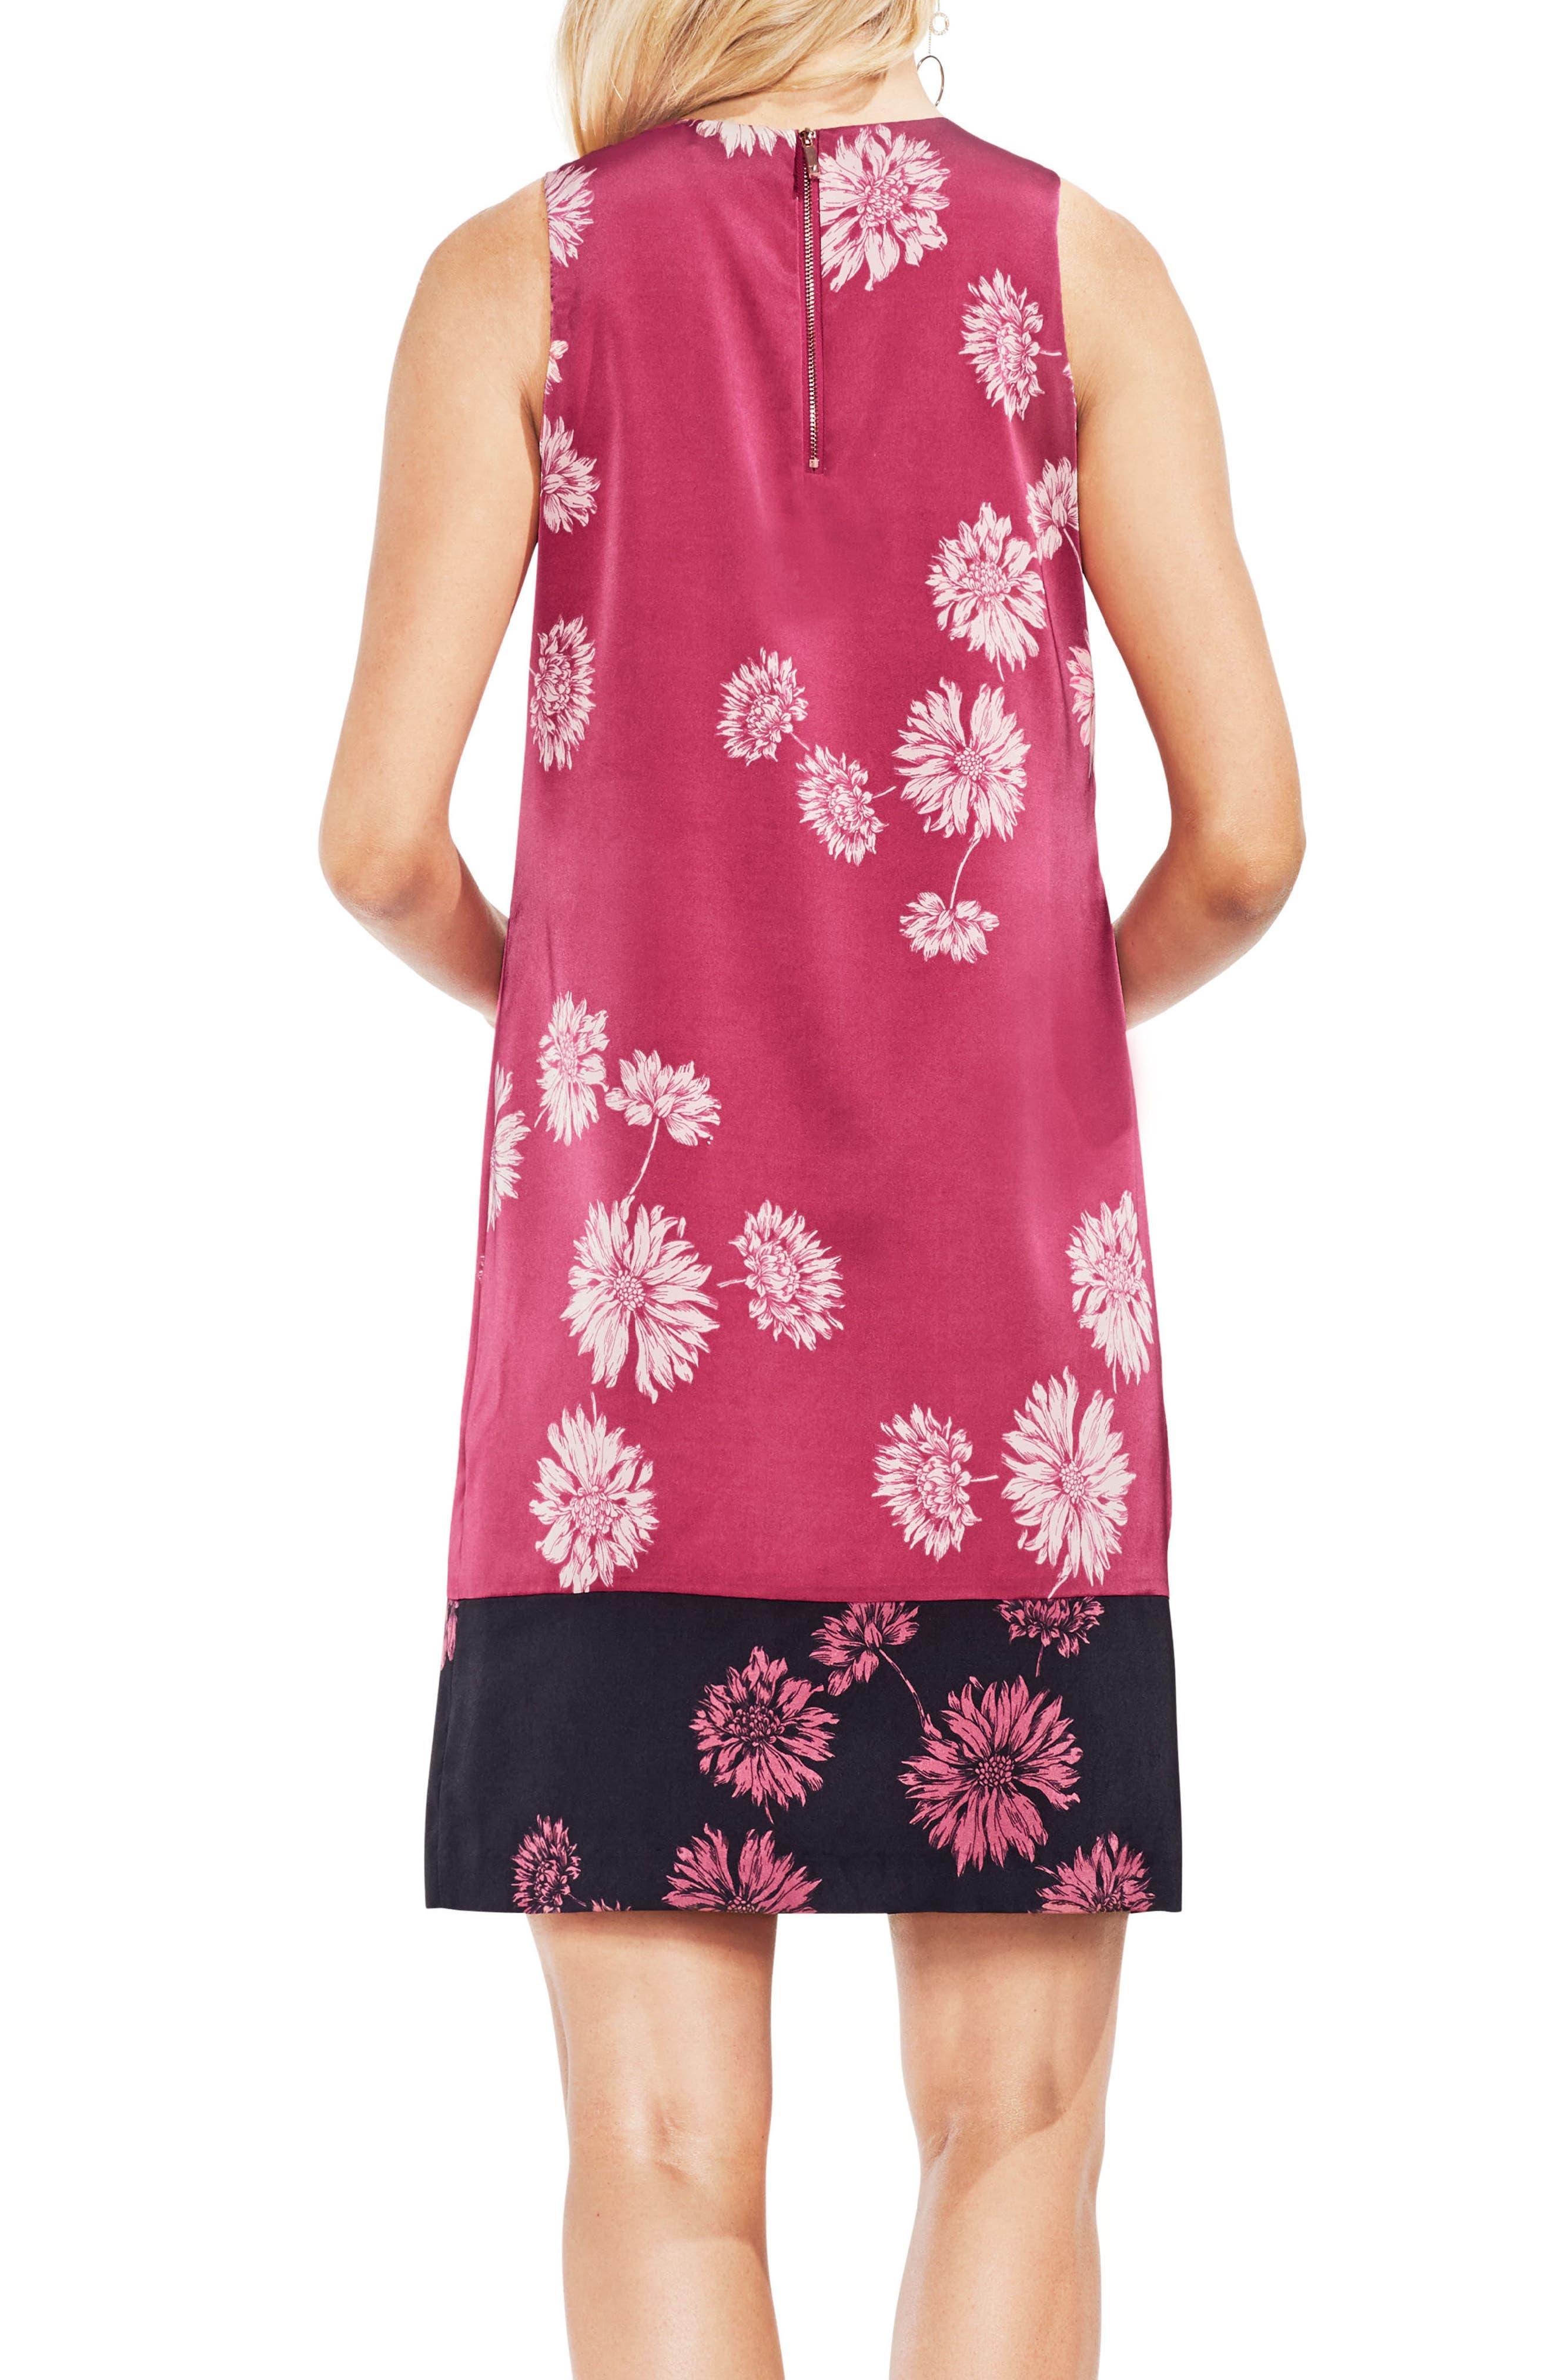 Chateau Floral Shift Dress,                             Alternate thumbnail 2, color,                             888-Pink Rose